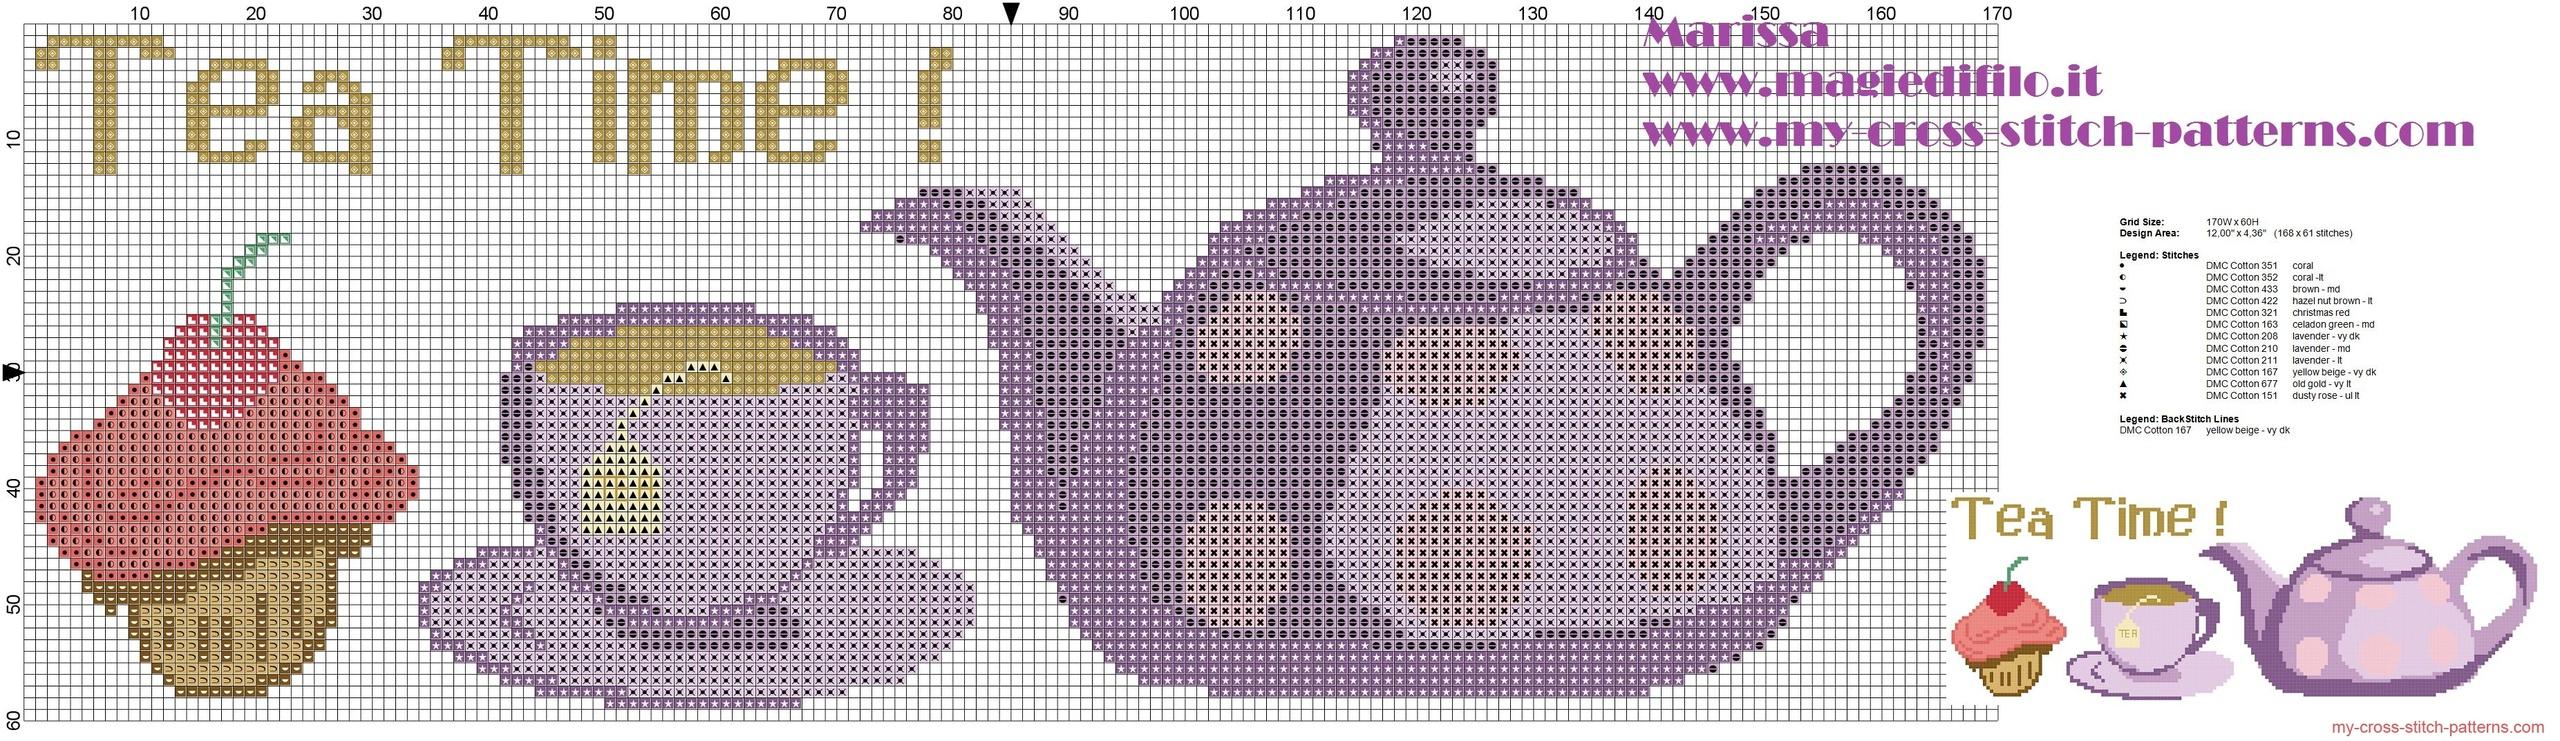 tea_time_border